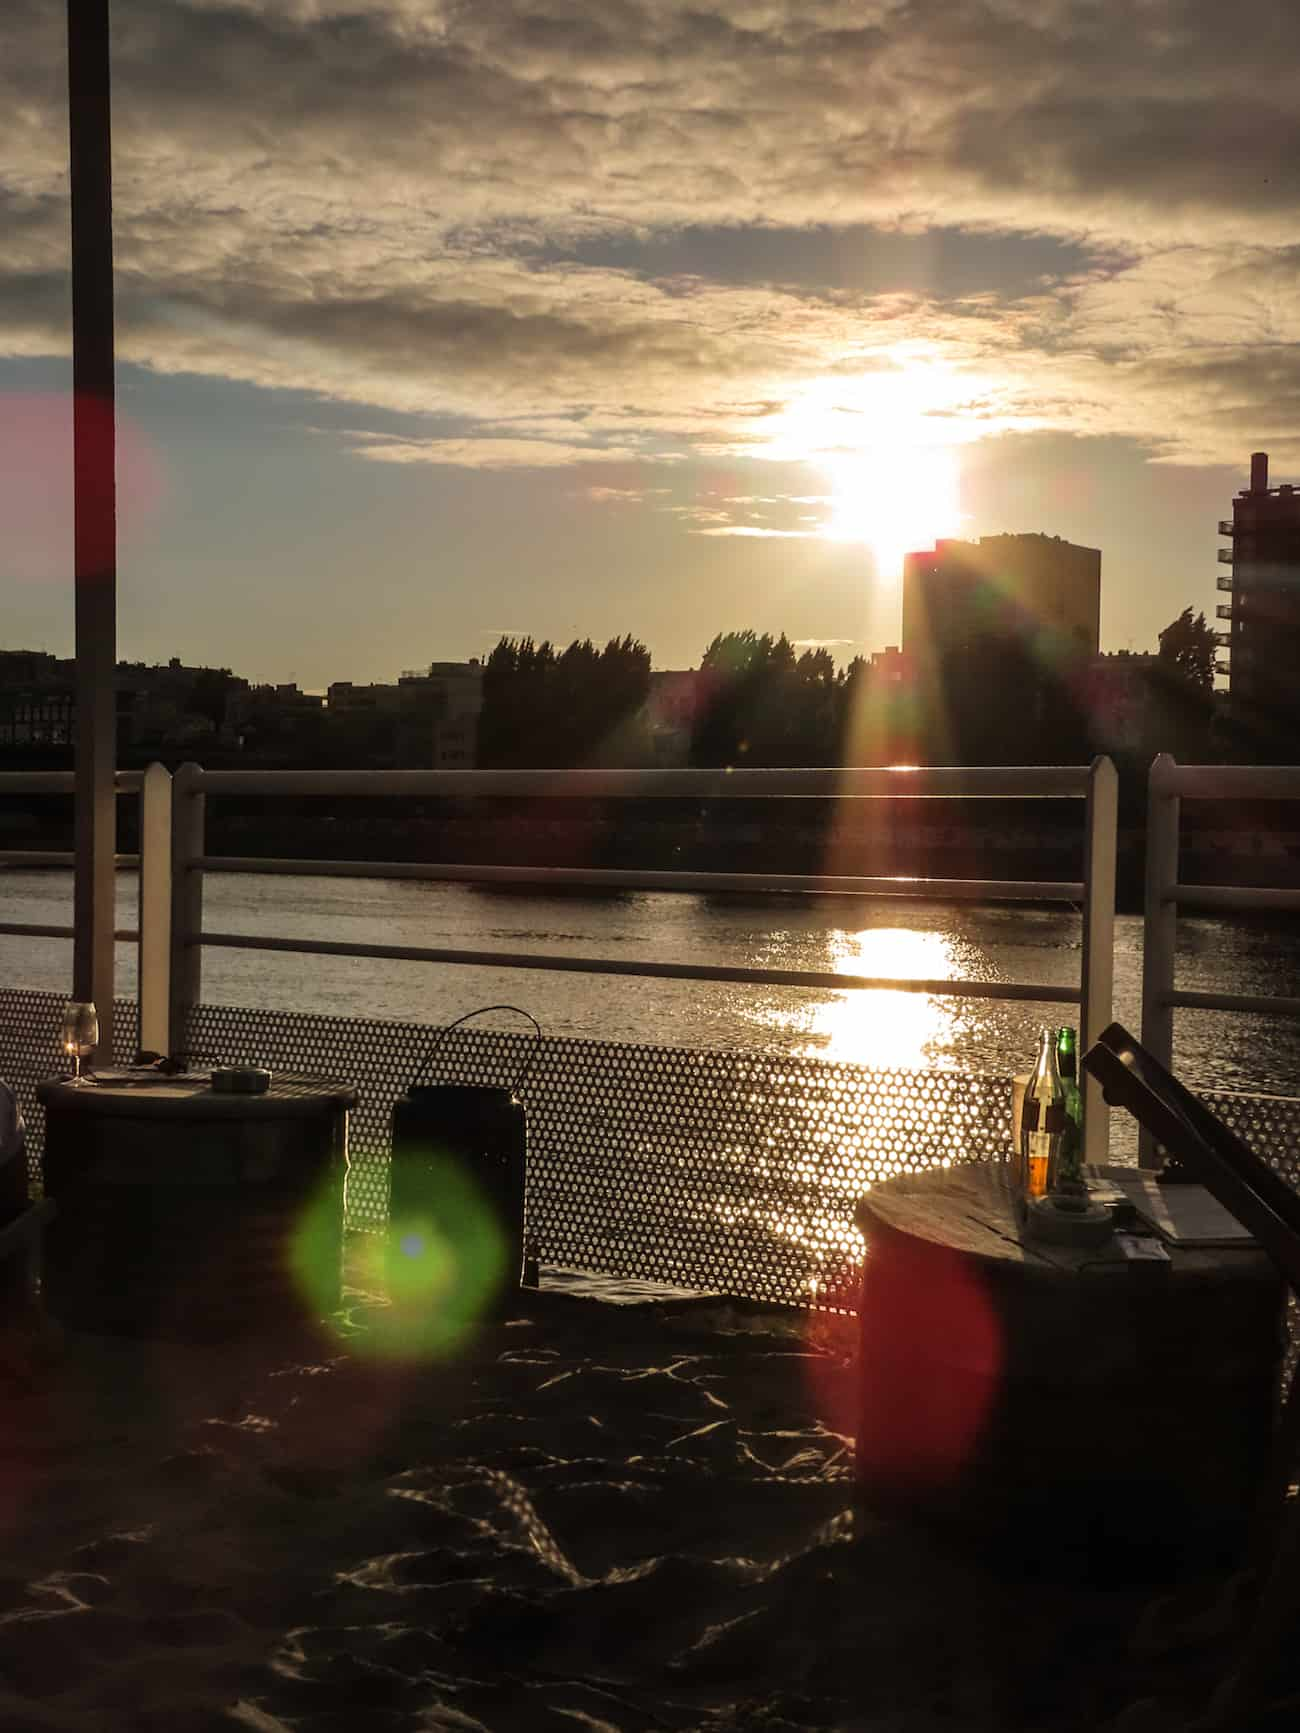 polpo-plage-terrasse-paris-bord-seine-restaurant-4